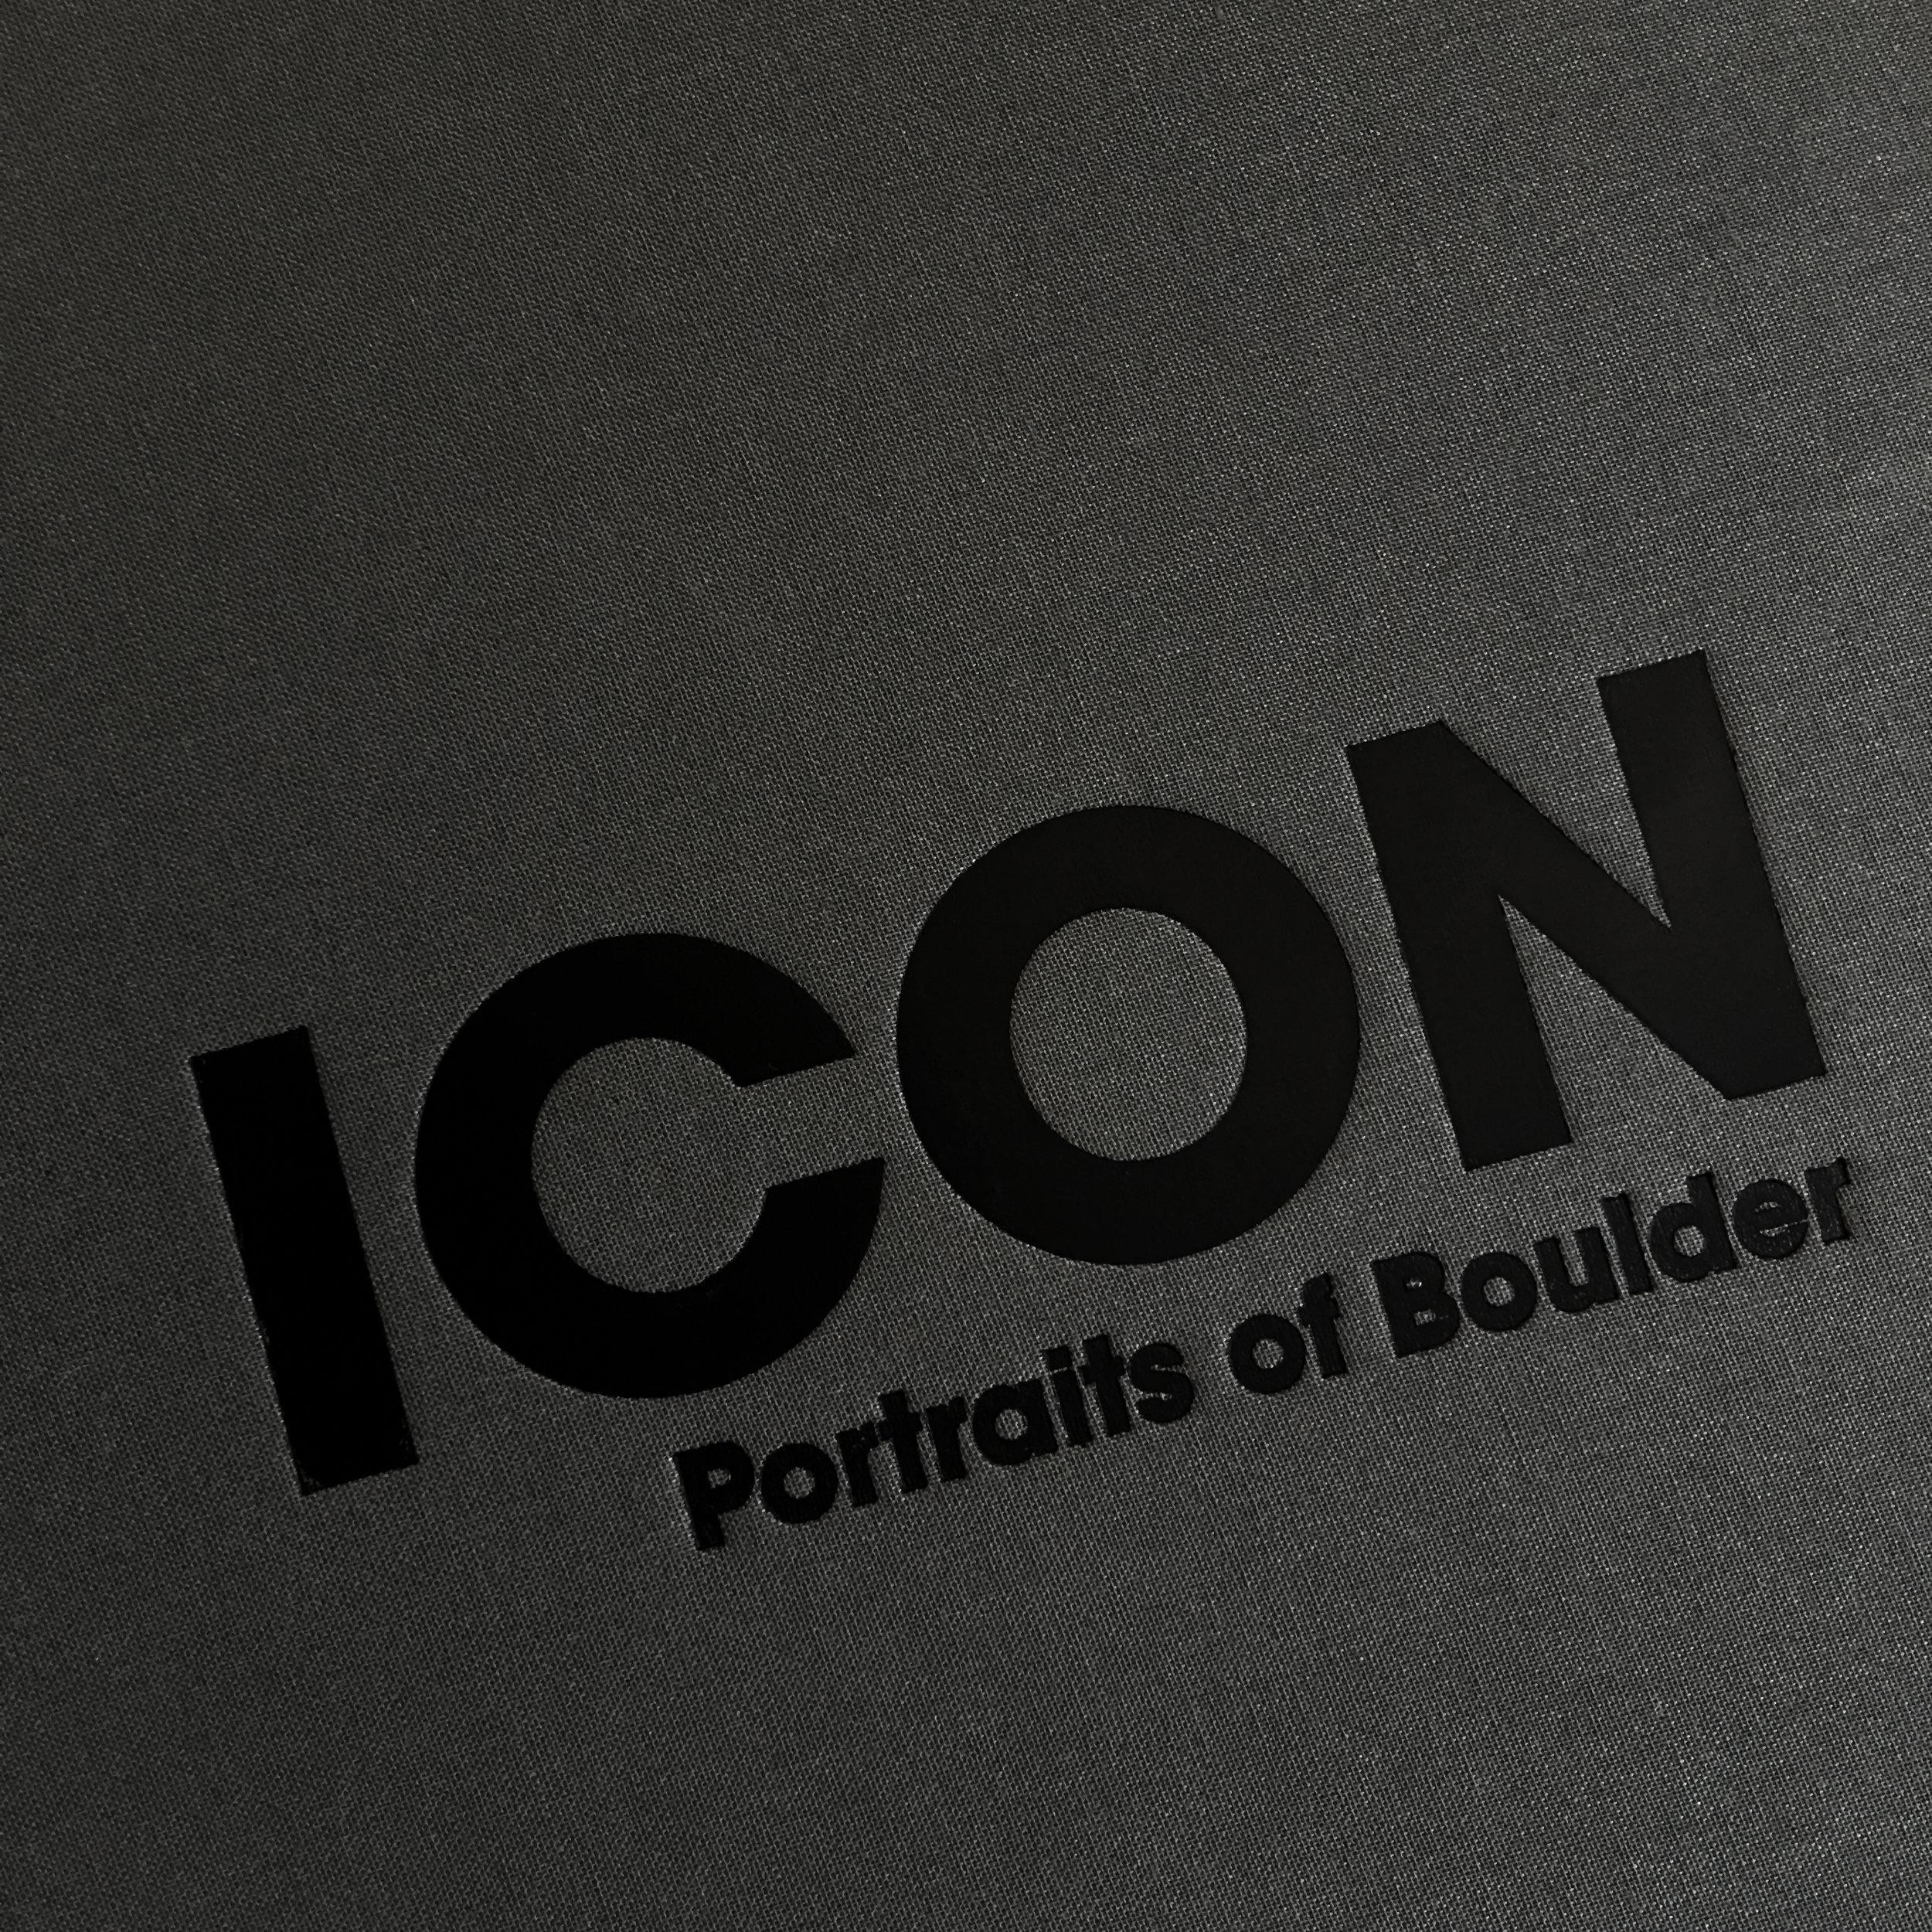 Boulder_3.jpg